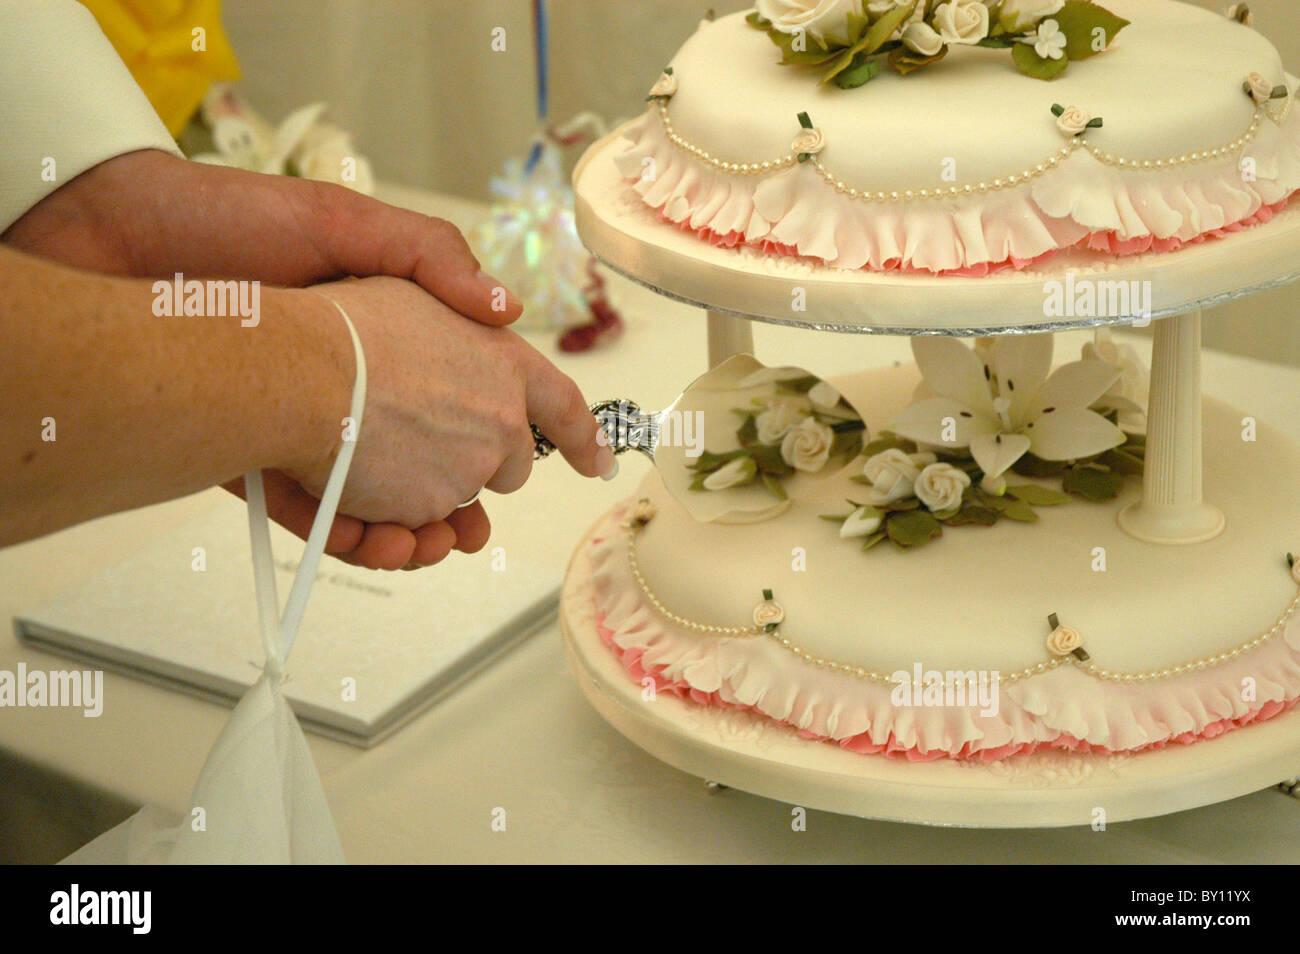 Slicing Wedding Cake Stock Photos & Slicing Wedding Cake Stock ...